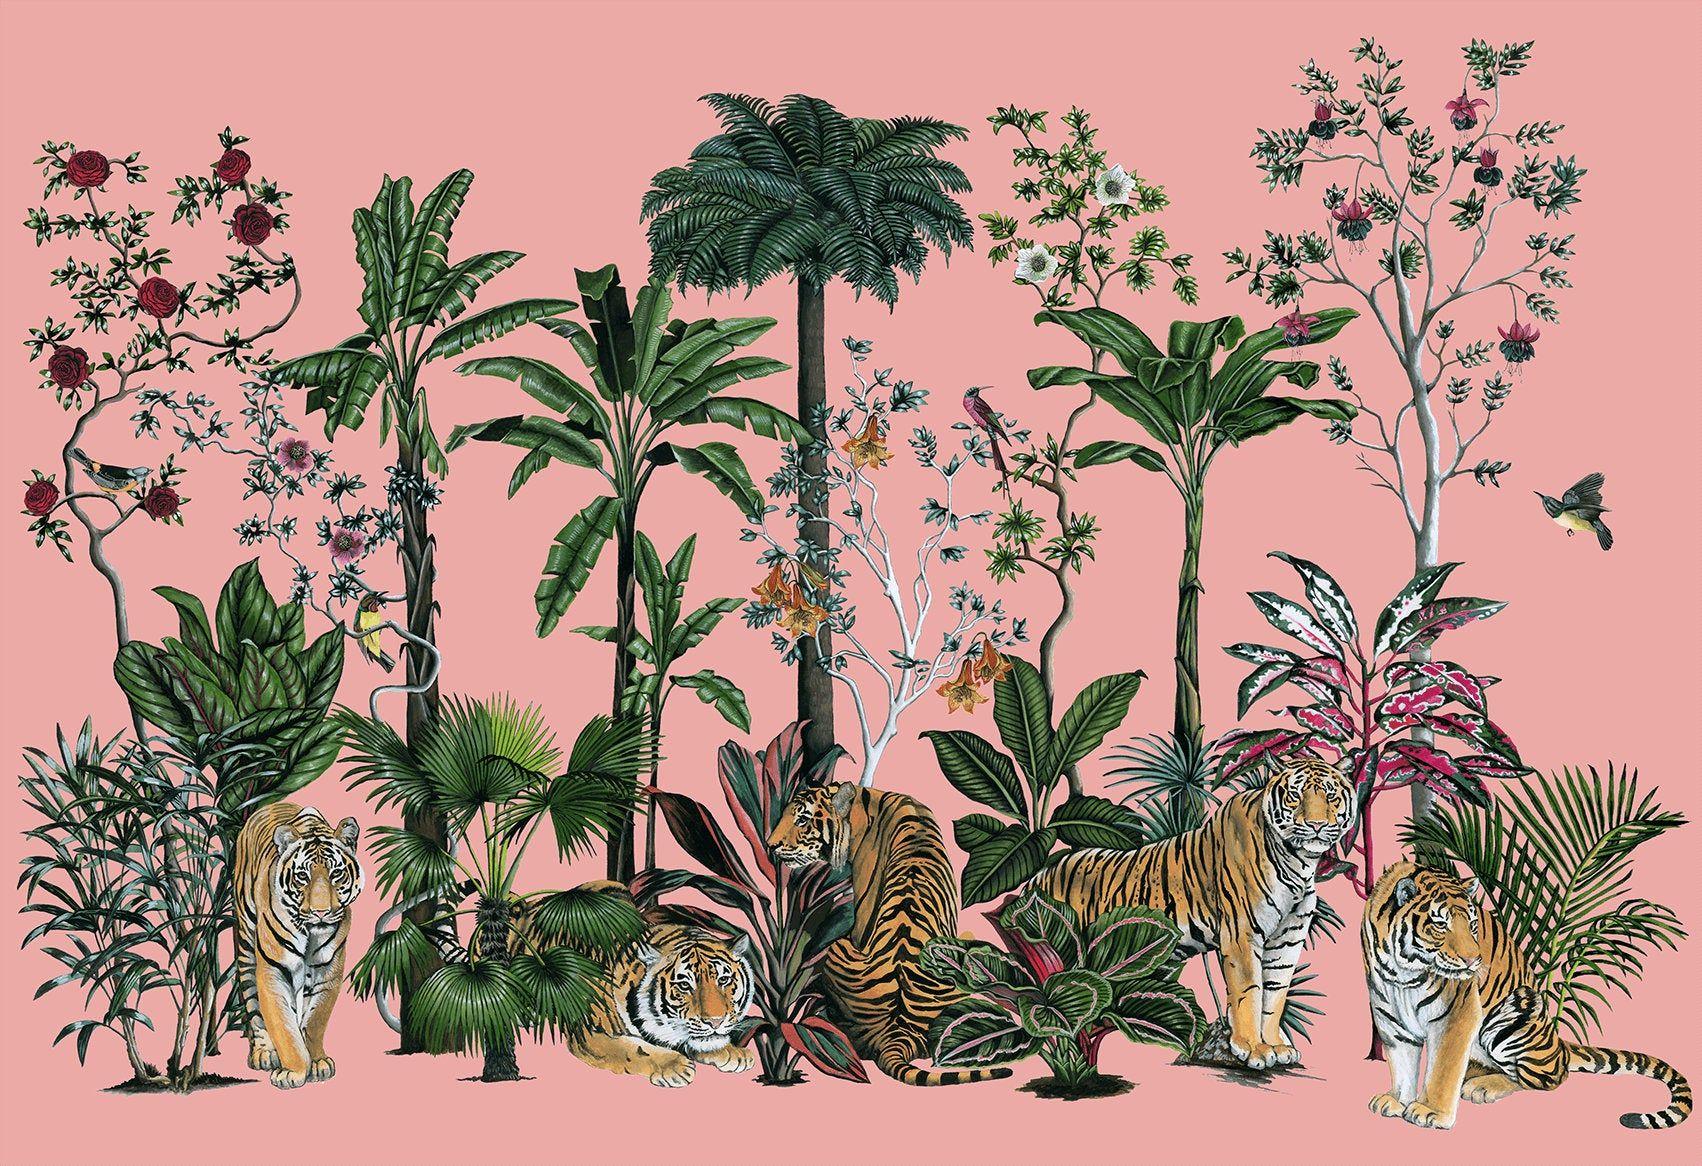 Tropical Tiger Chinoiserie Wall Mural 561 Etsy Wall Murals Mural Botanical Wallpaper